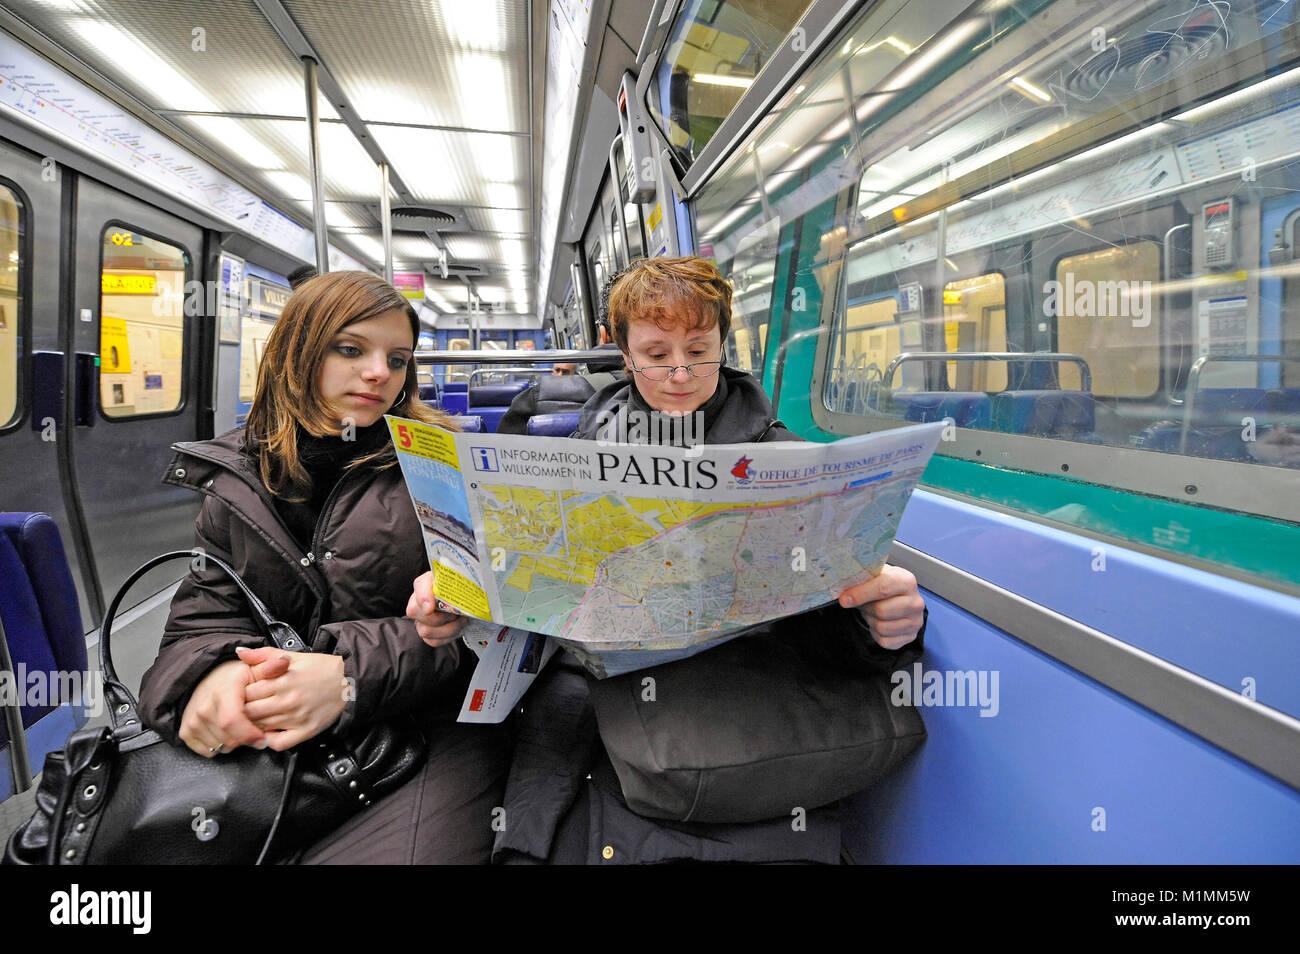 Tourists in Metro Paris, France, Touristen in Metro Paris, Frankreich - Stock Image